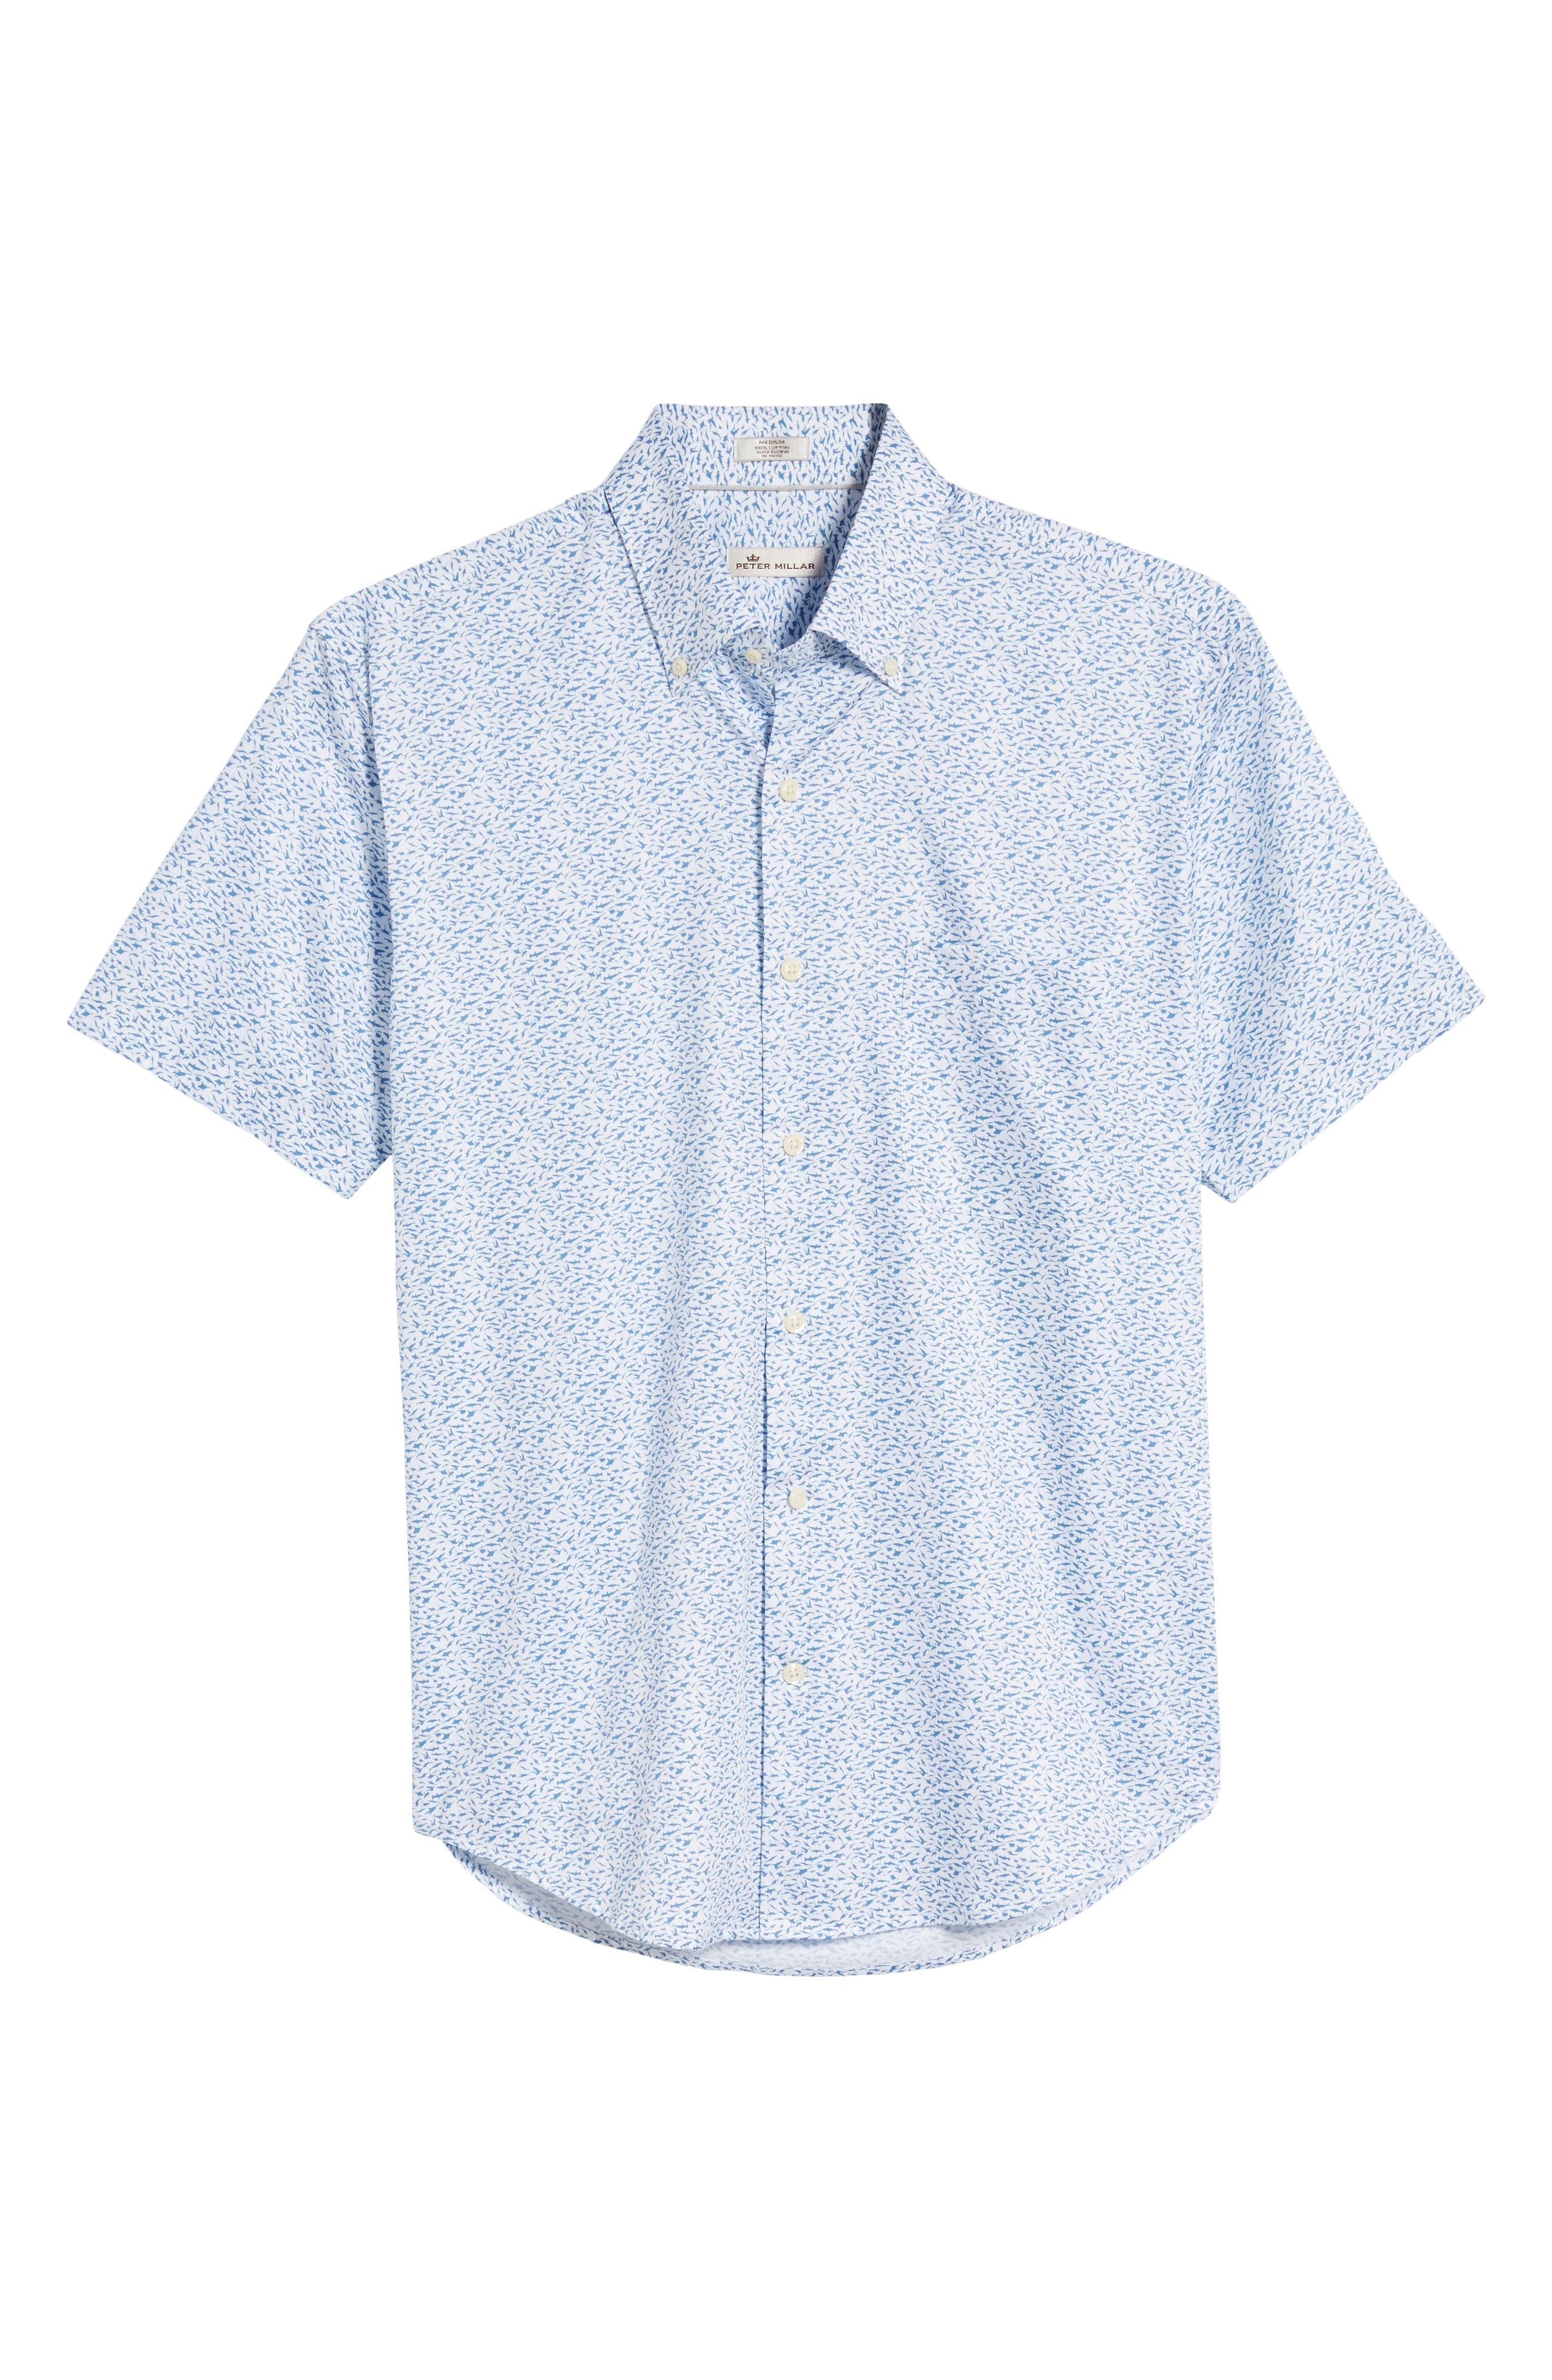 Hammer Time Regular Fit Print Sport Shirt,                             Alternate thumbnail 6, color,